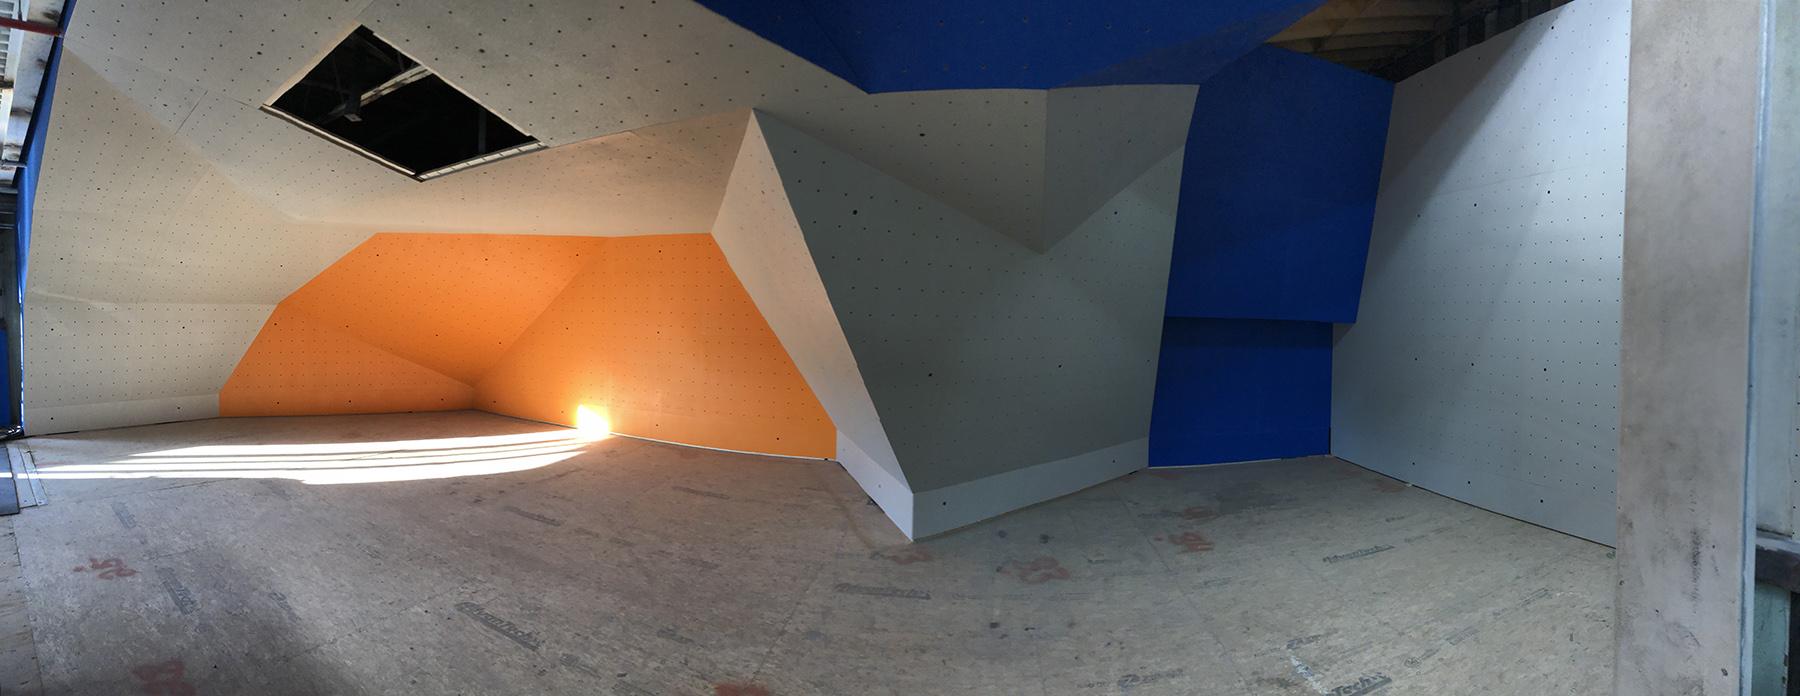 RCF-Cave-1.jpg